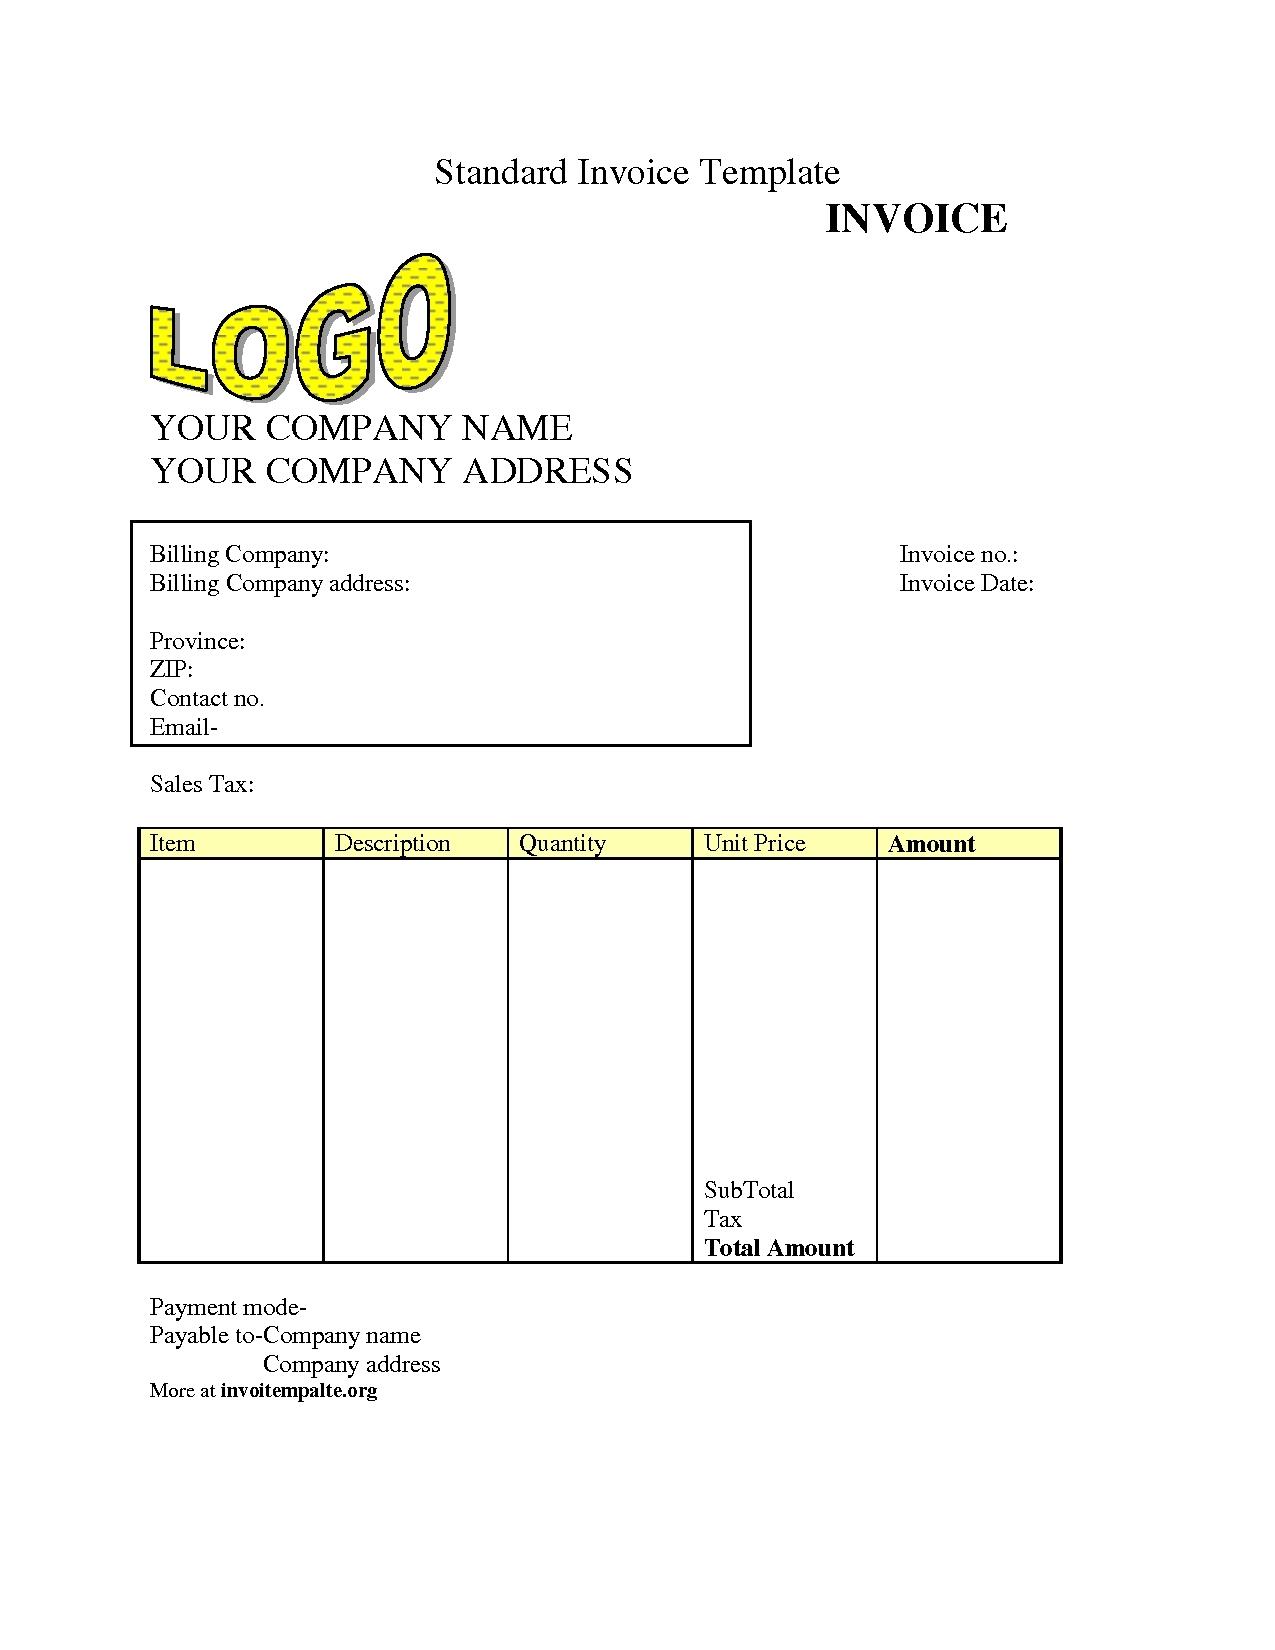 free invoice template downloads invoice template free 2016 free invoice templet